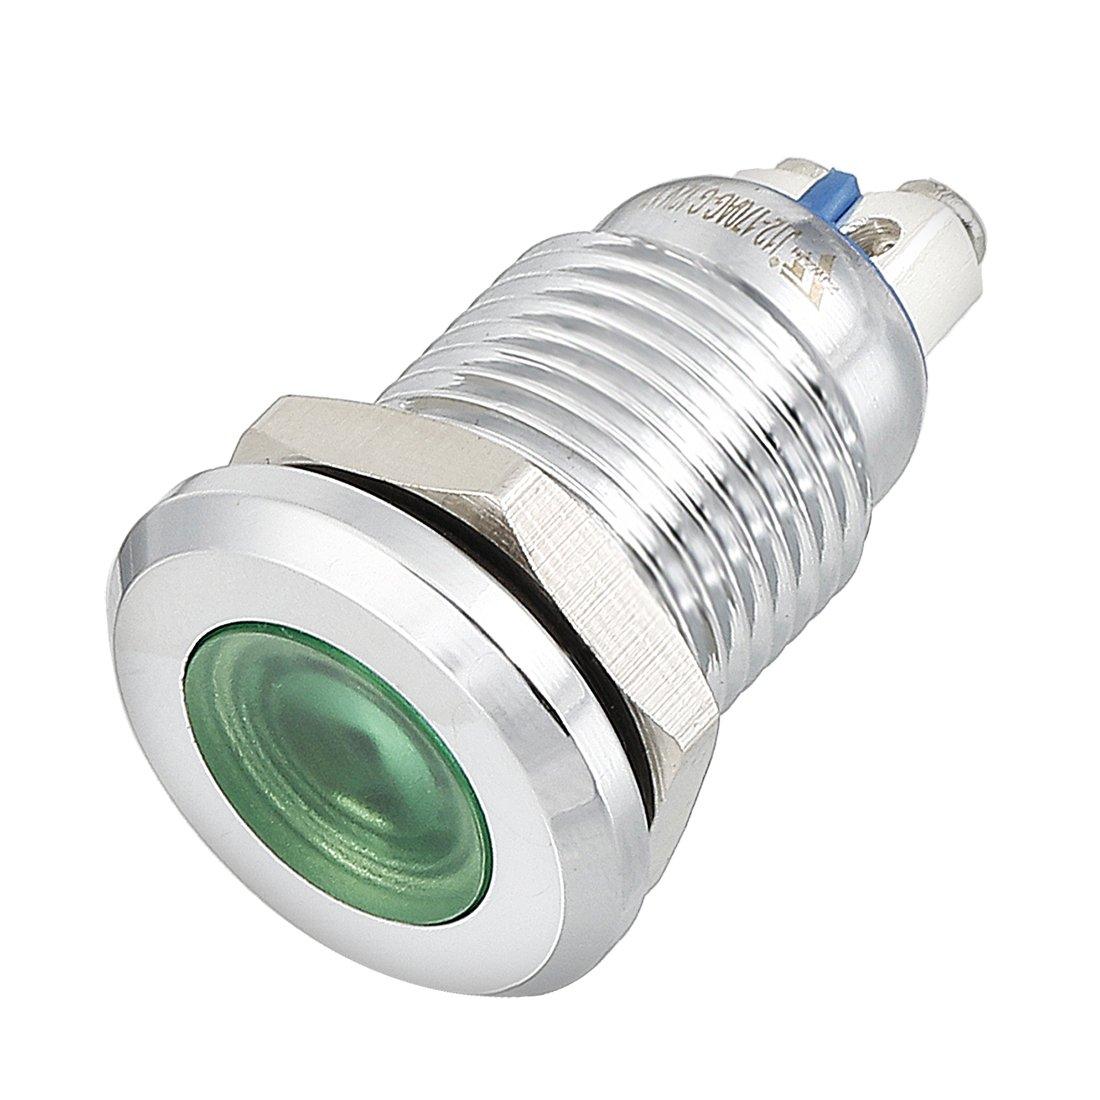 uxcell LED Indicator Light DC 12V 12mm Green Metal Shell Pilot Custom Dash Signal Lamp Flat Head